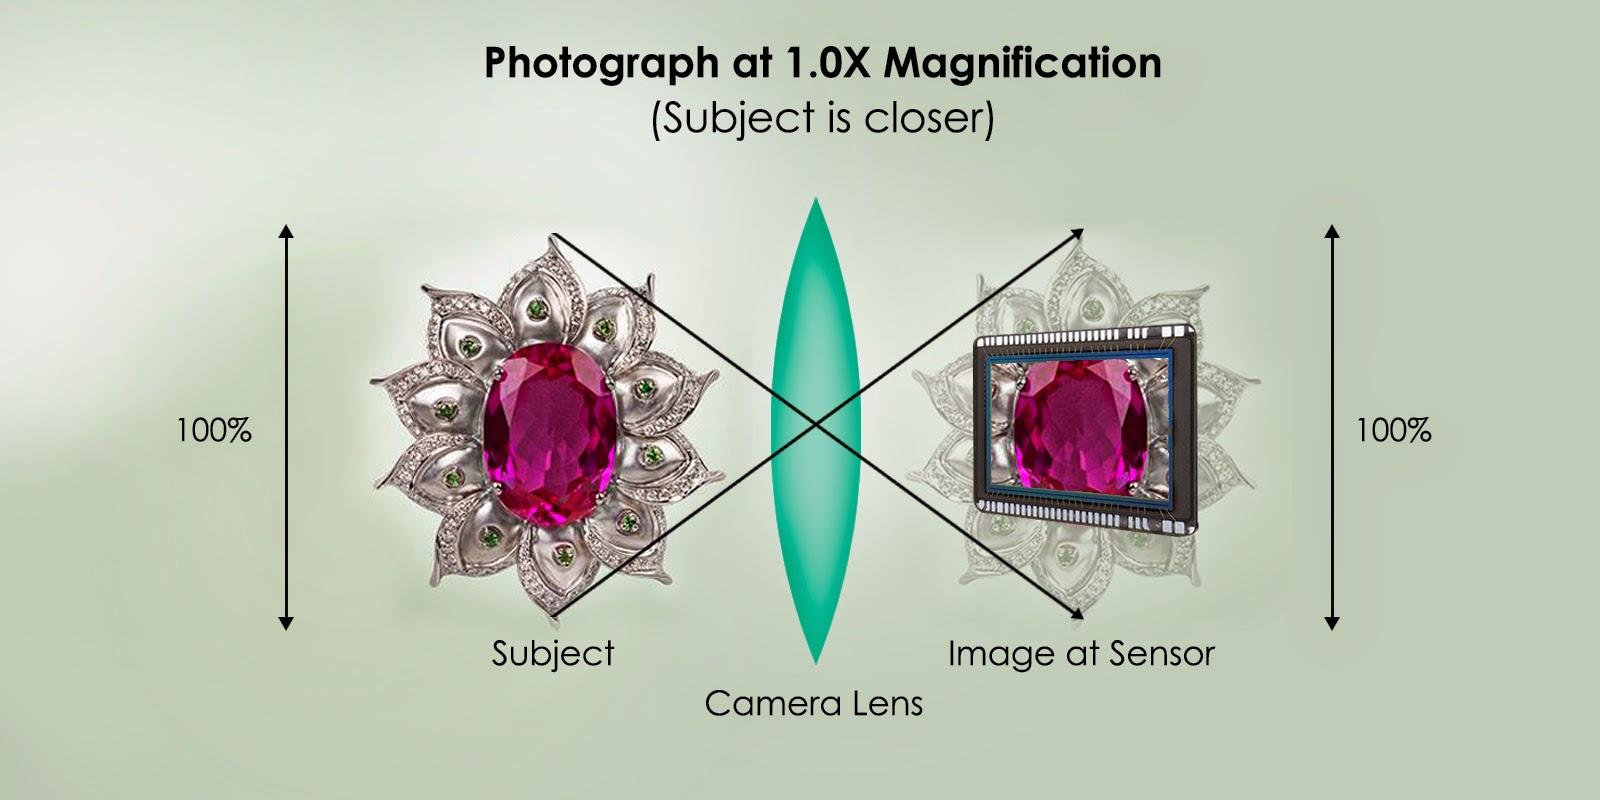 Photograph at 1.0x magnification